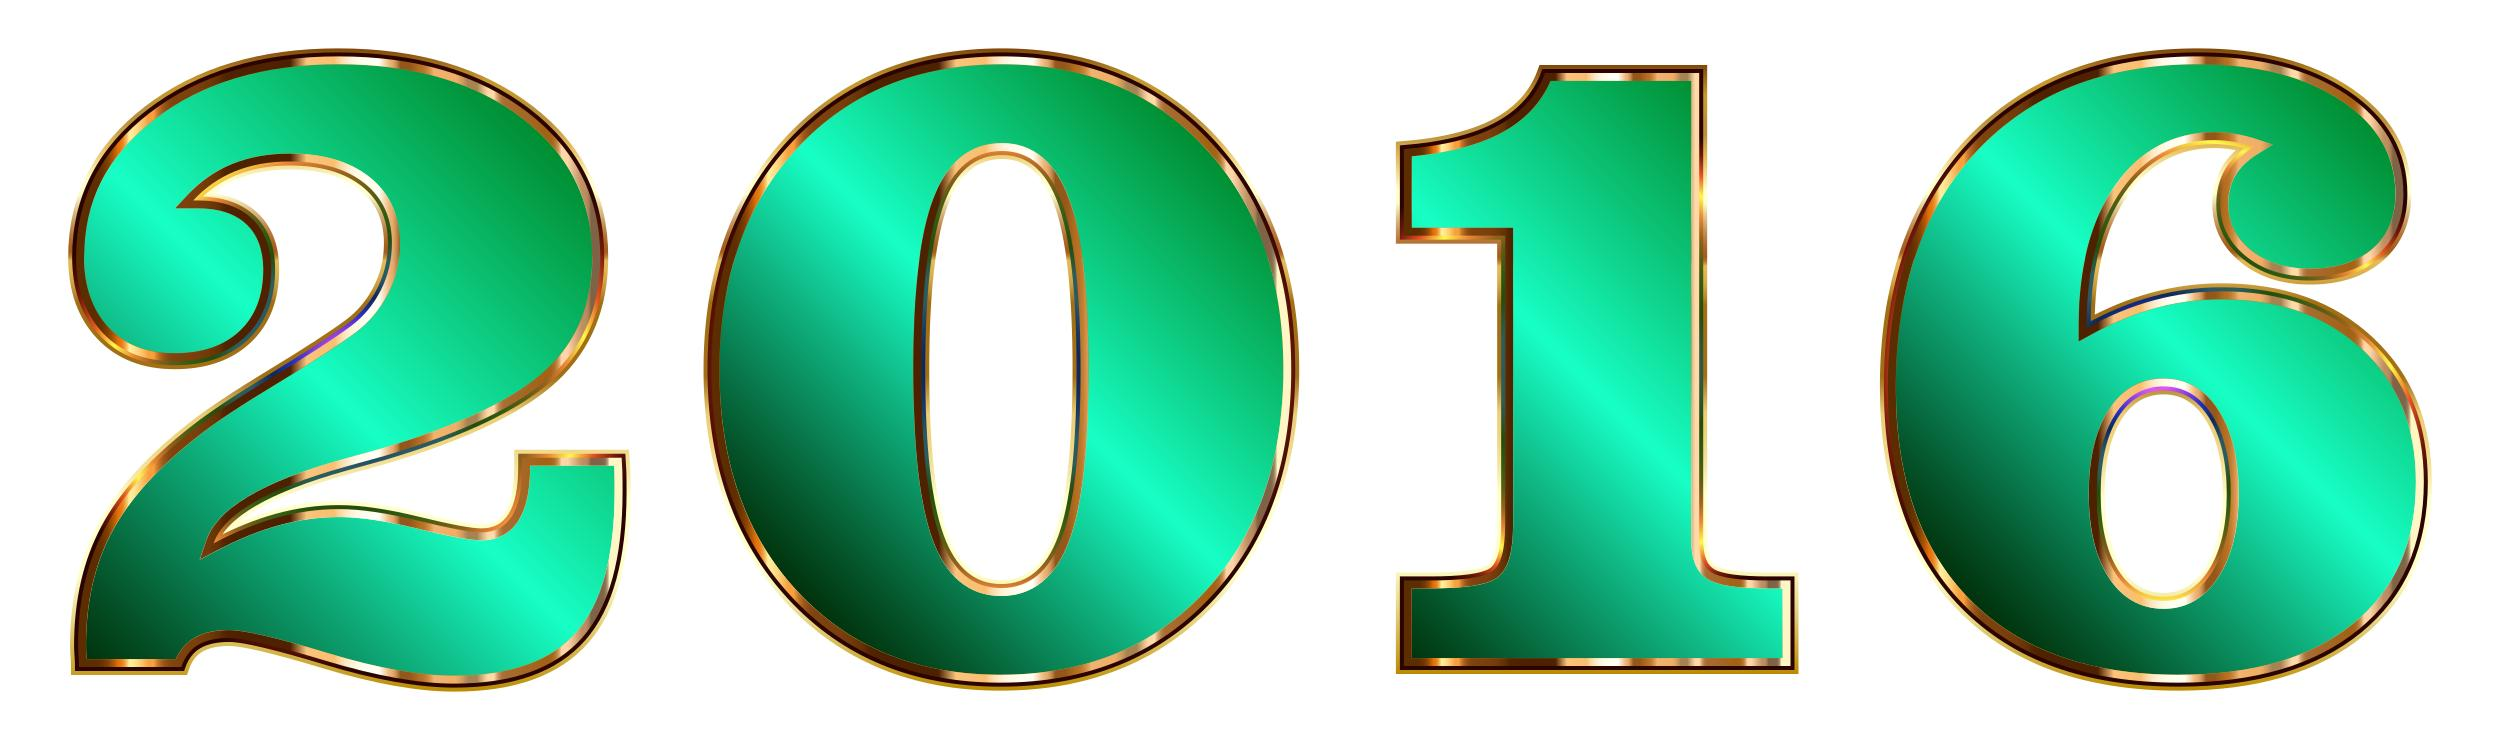 2500x740 2016 Typography 10 Clipart